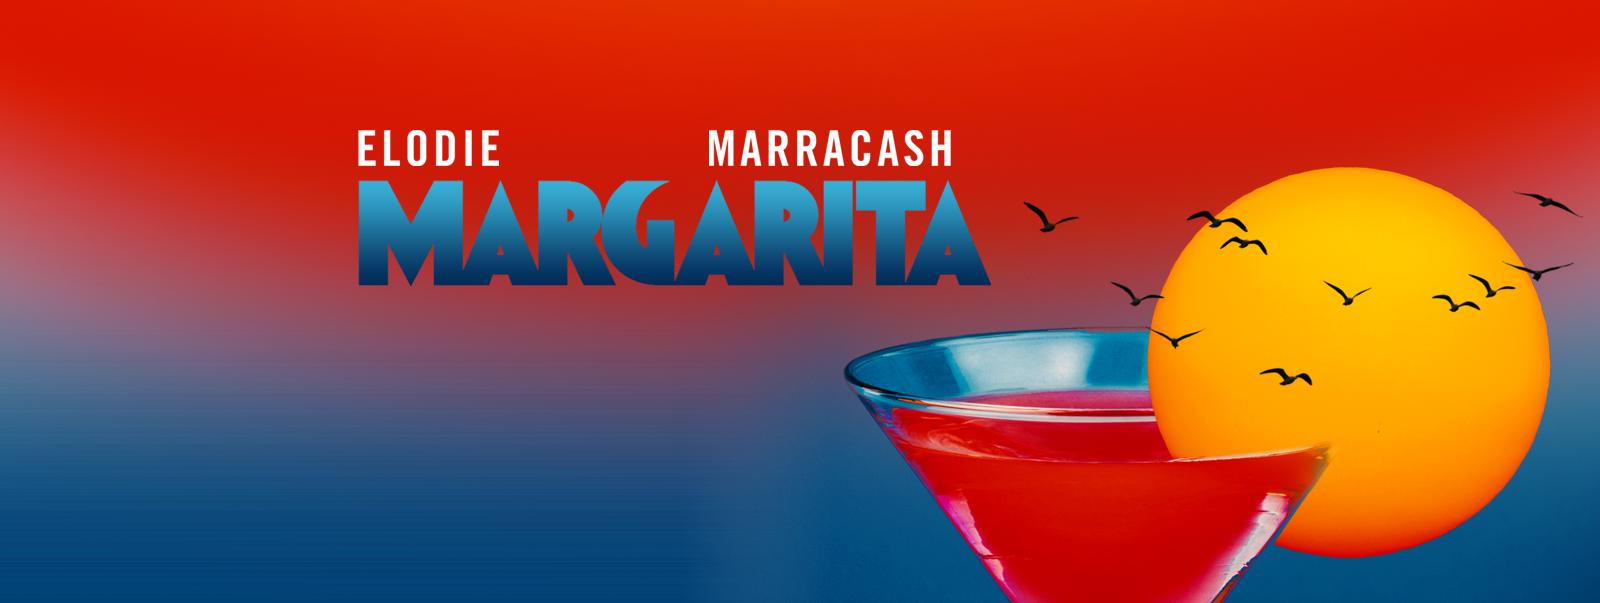 Margarita - Elodie Featuring Marracash